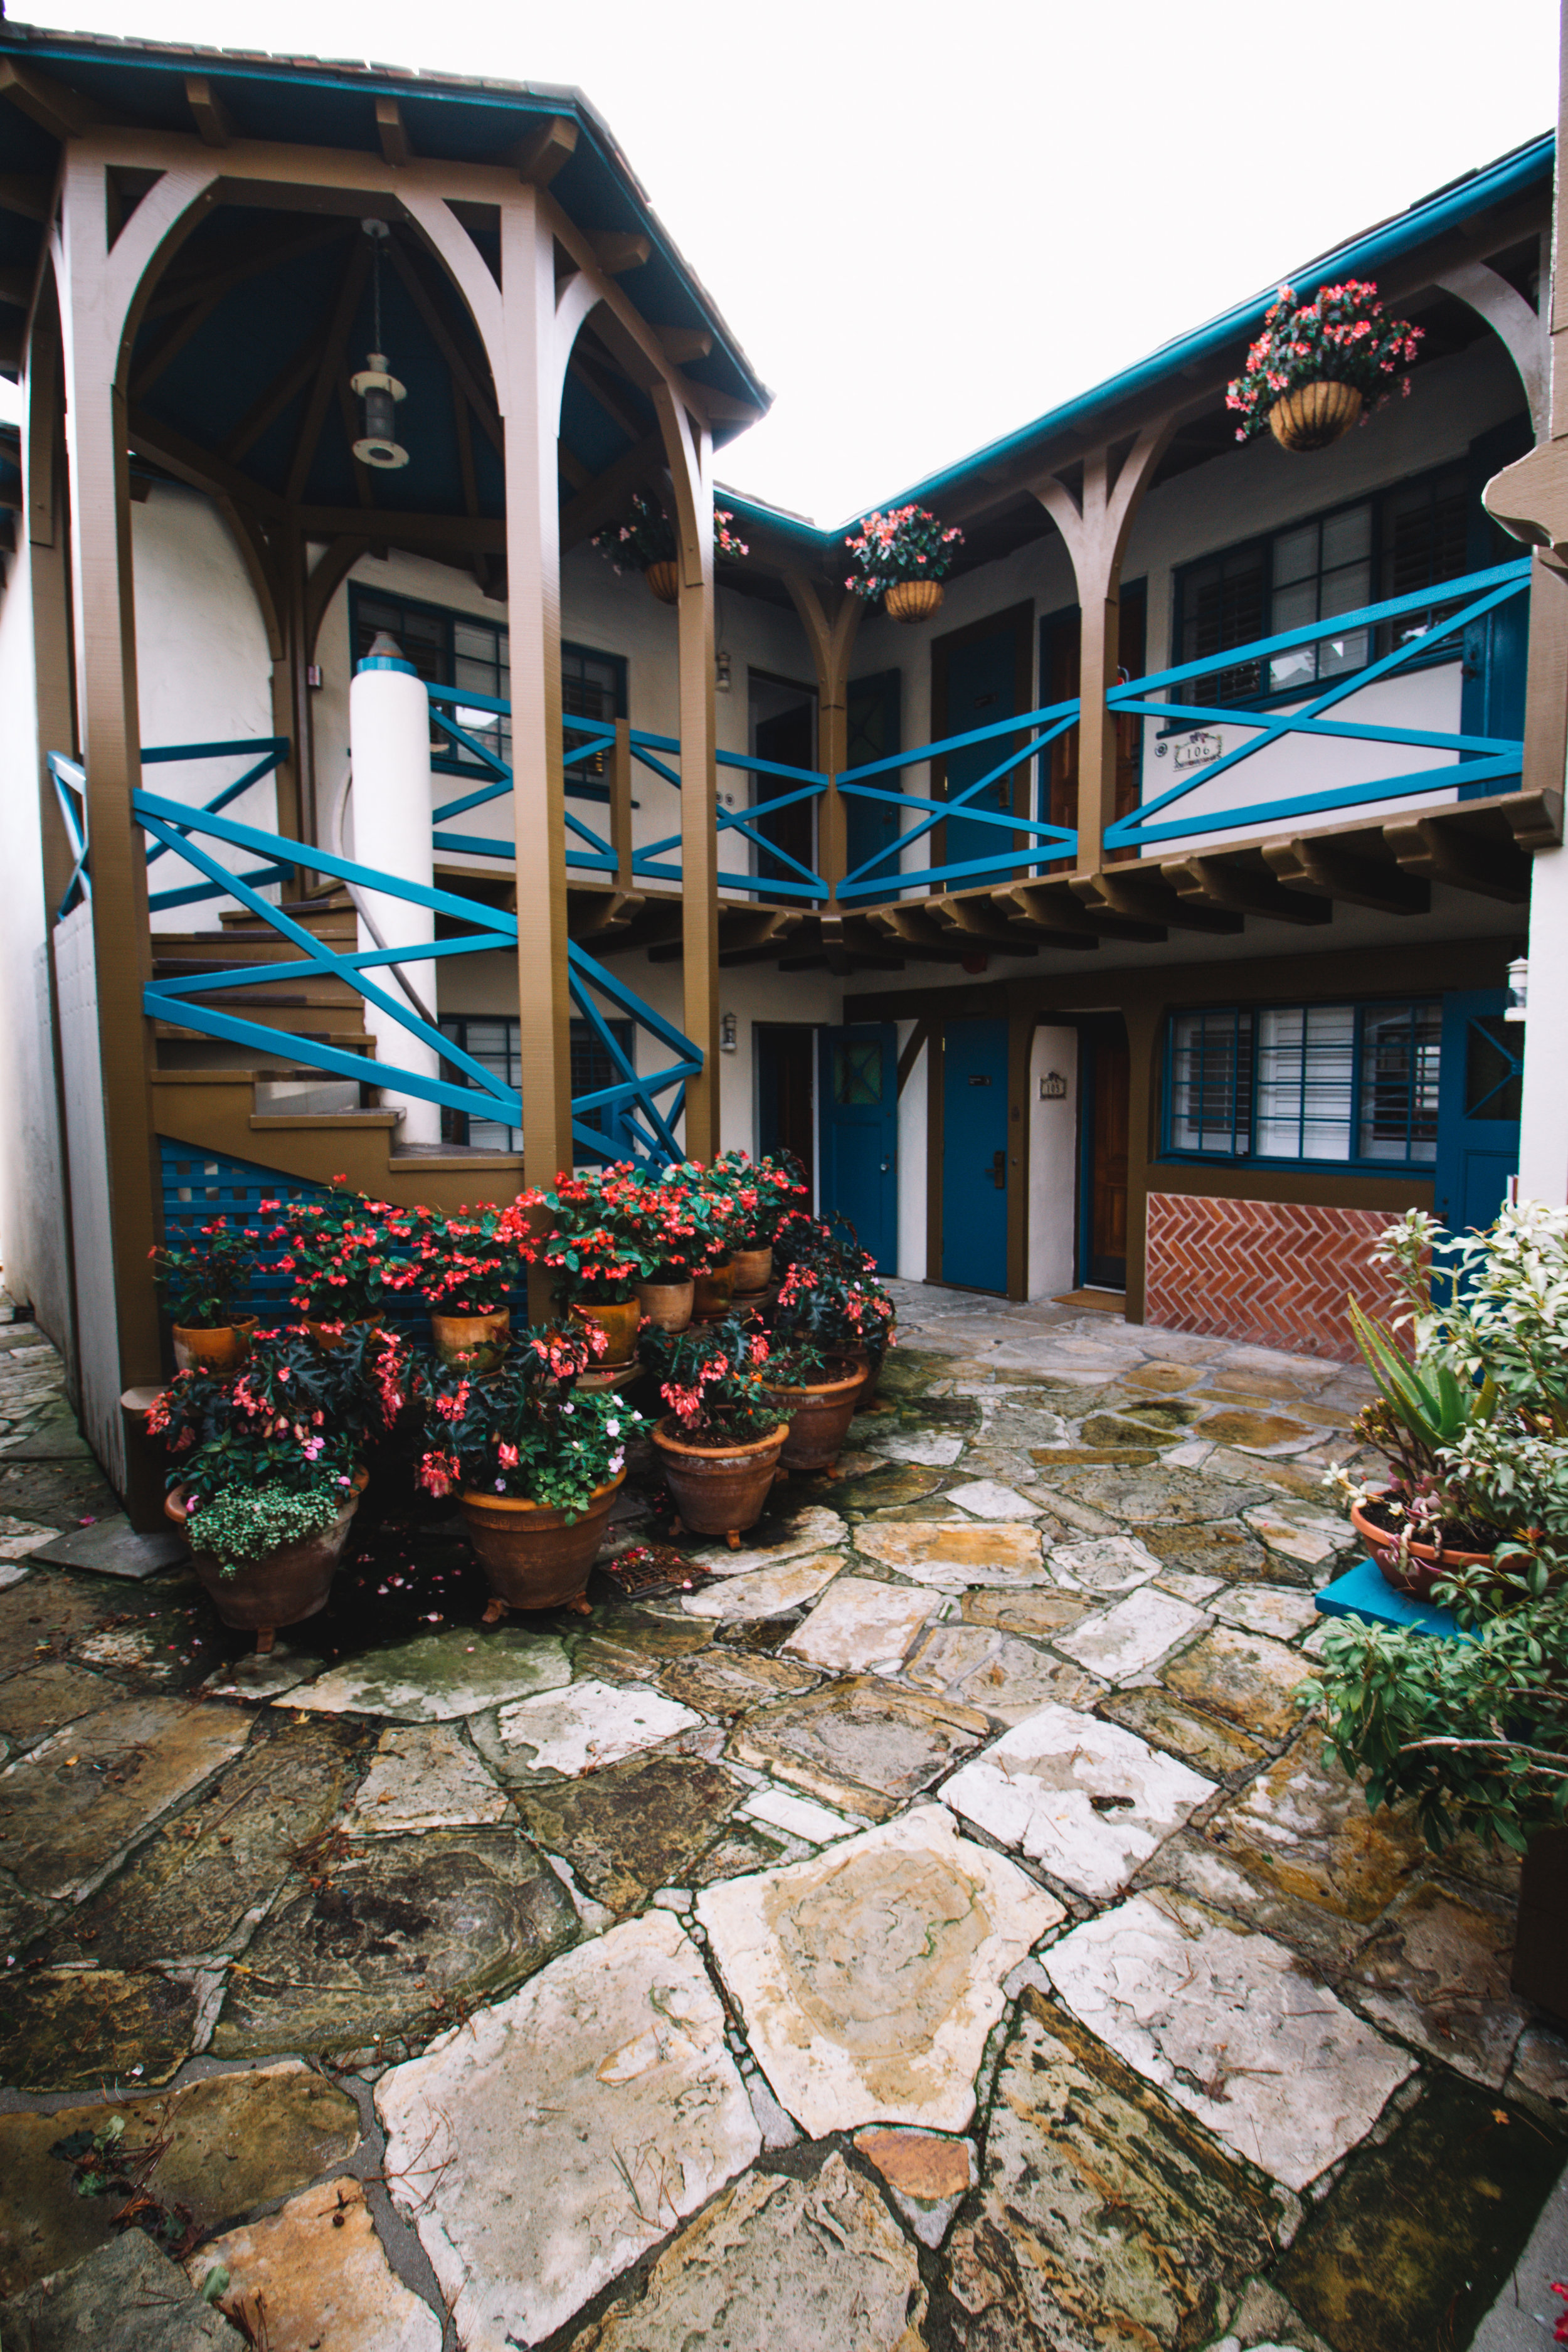 Hotel Normandy Courtyard in Carmel